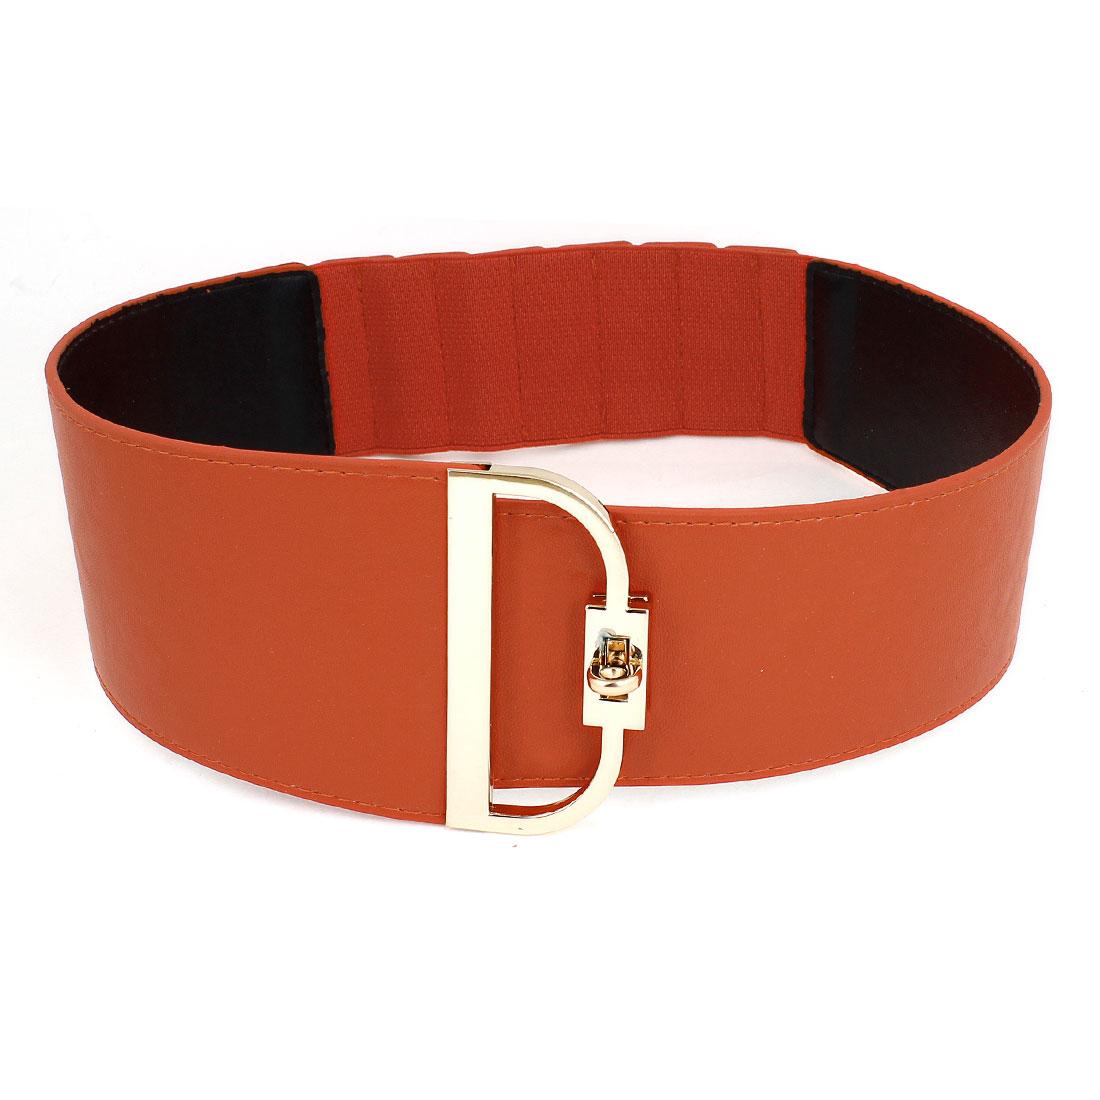 Woman Lady Orange Red Faux Leather Wrapped Metal Turn Lock Buckle Cinch Belt